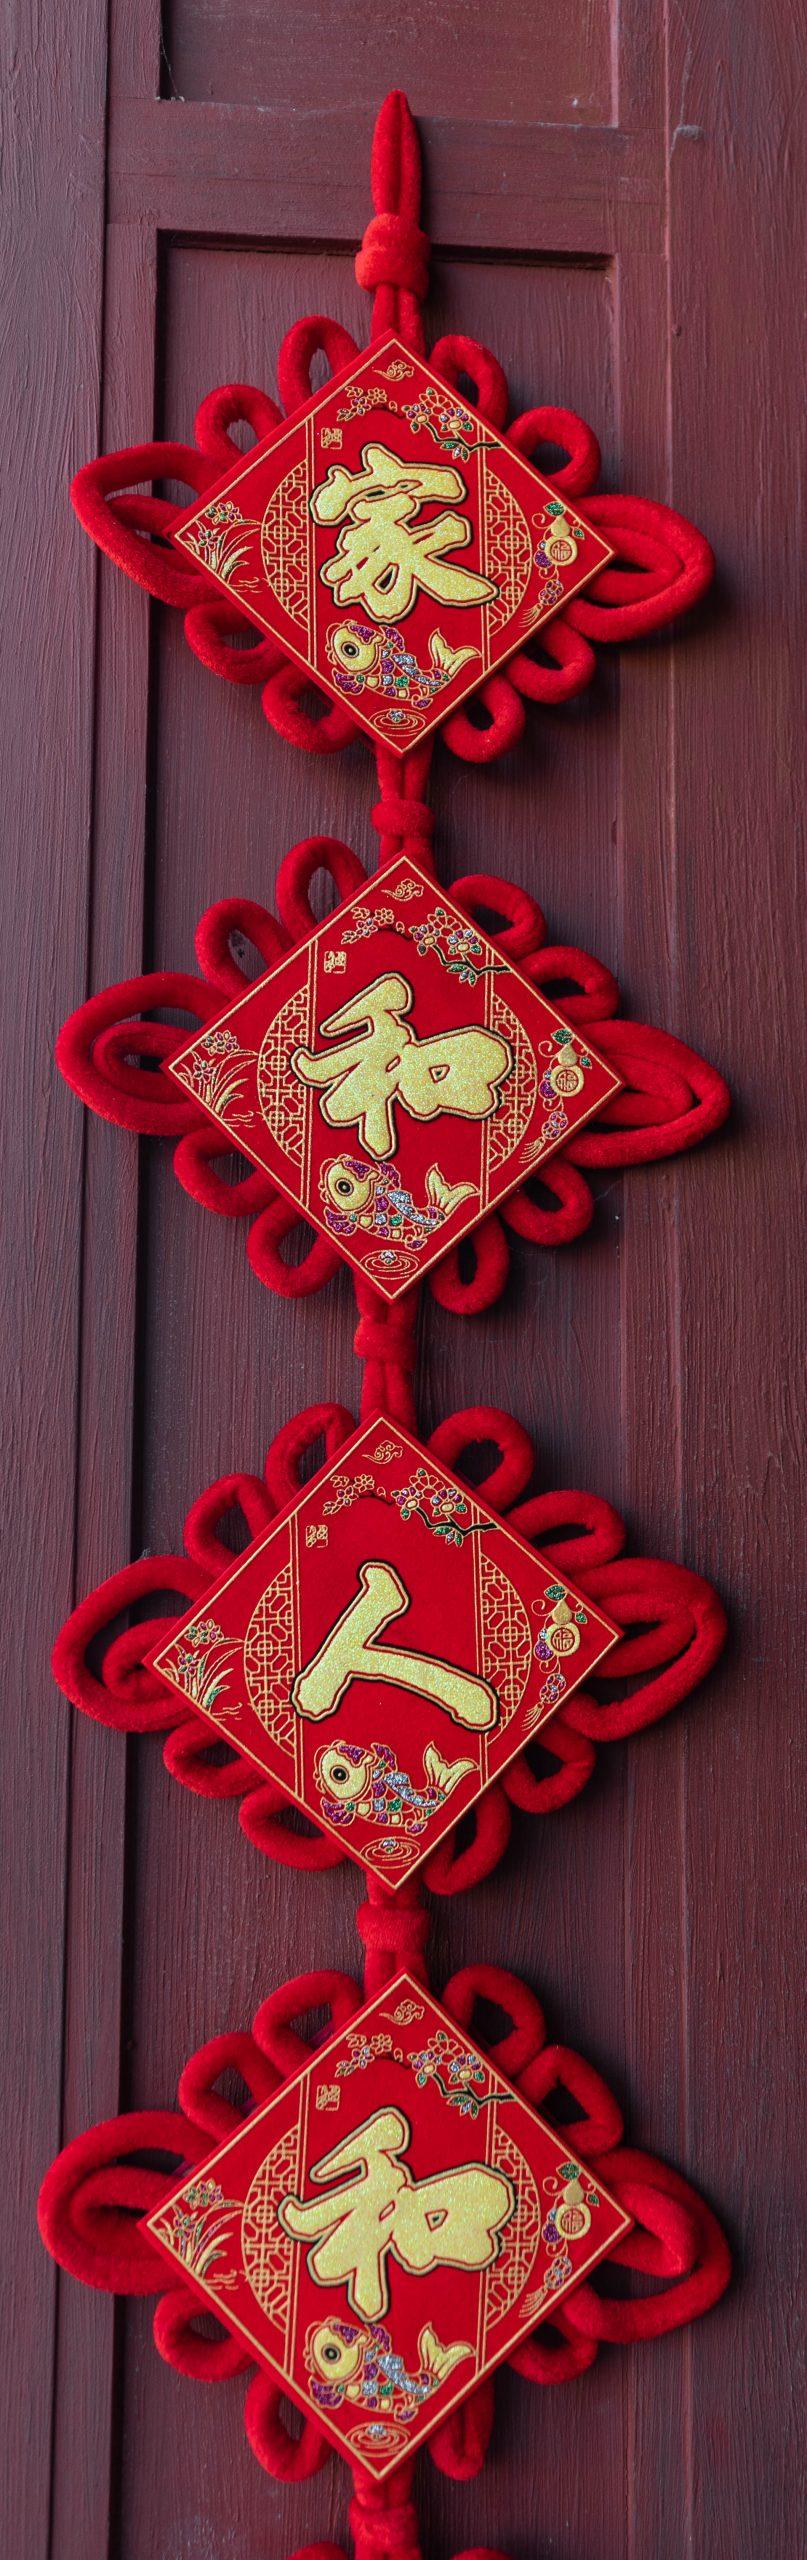 China at Epcot Walt Disney World by Luxury Travel Writer and Photographer Annie Fairfax